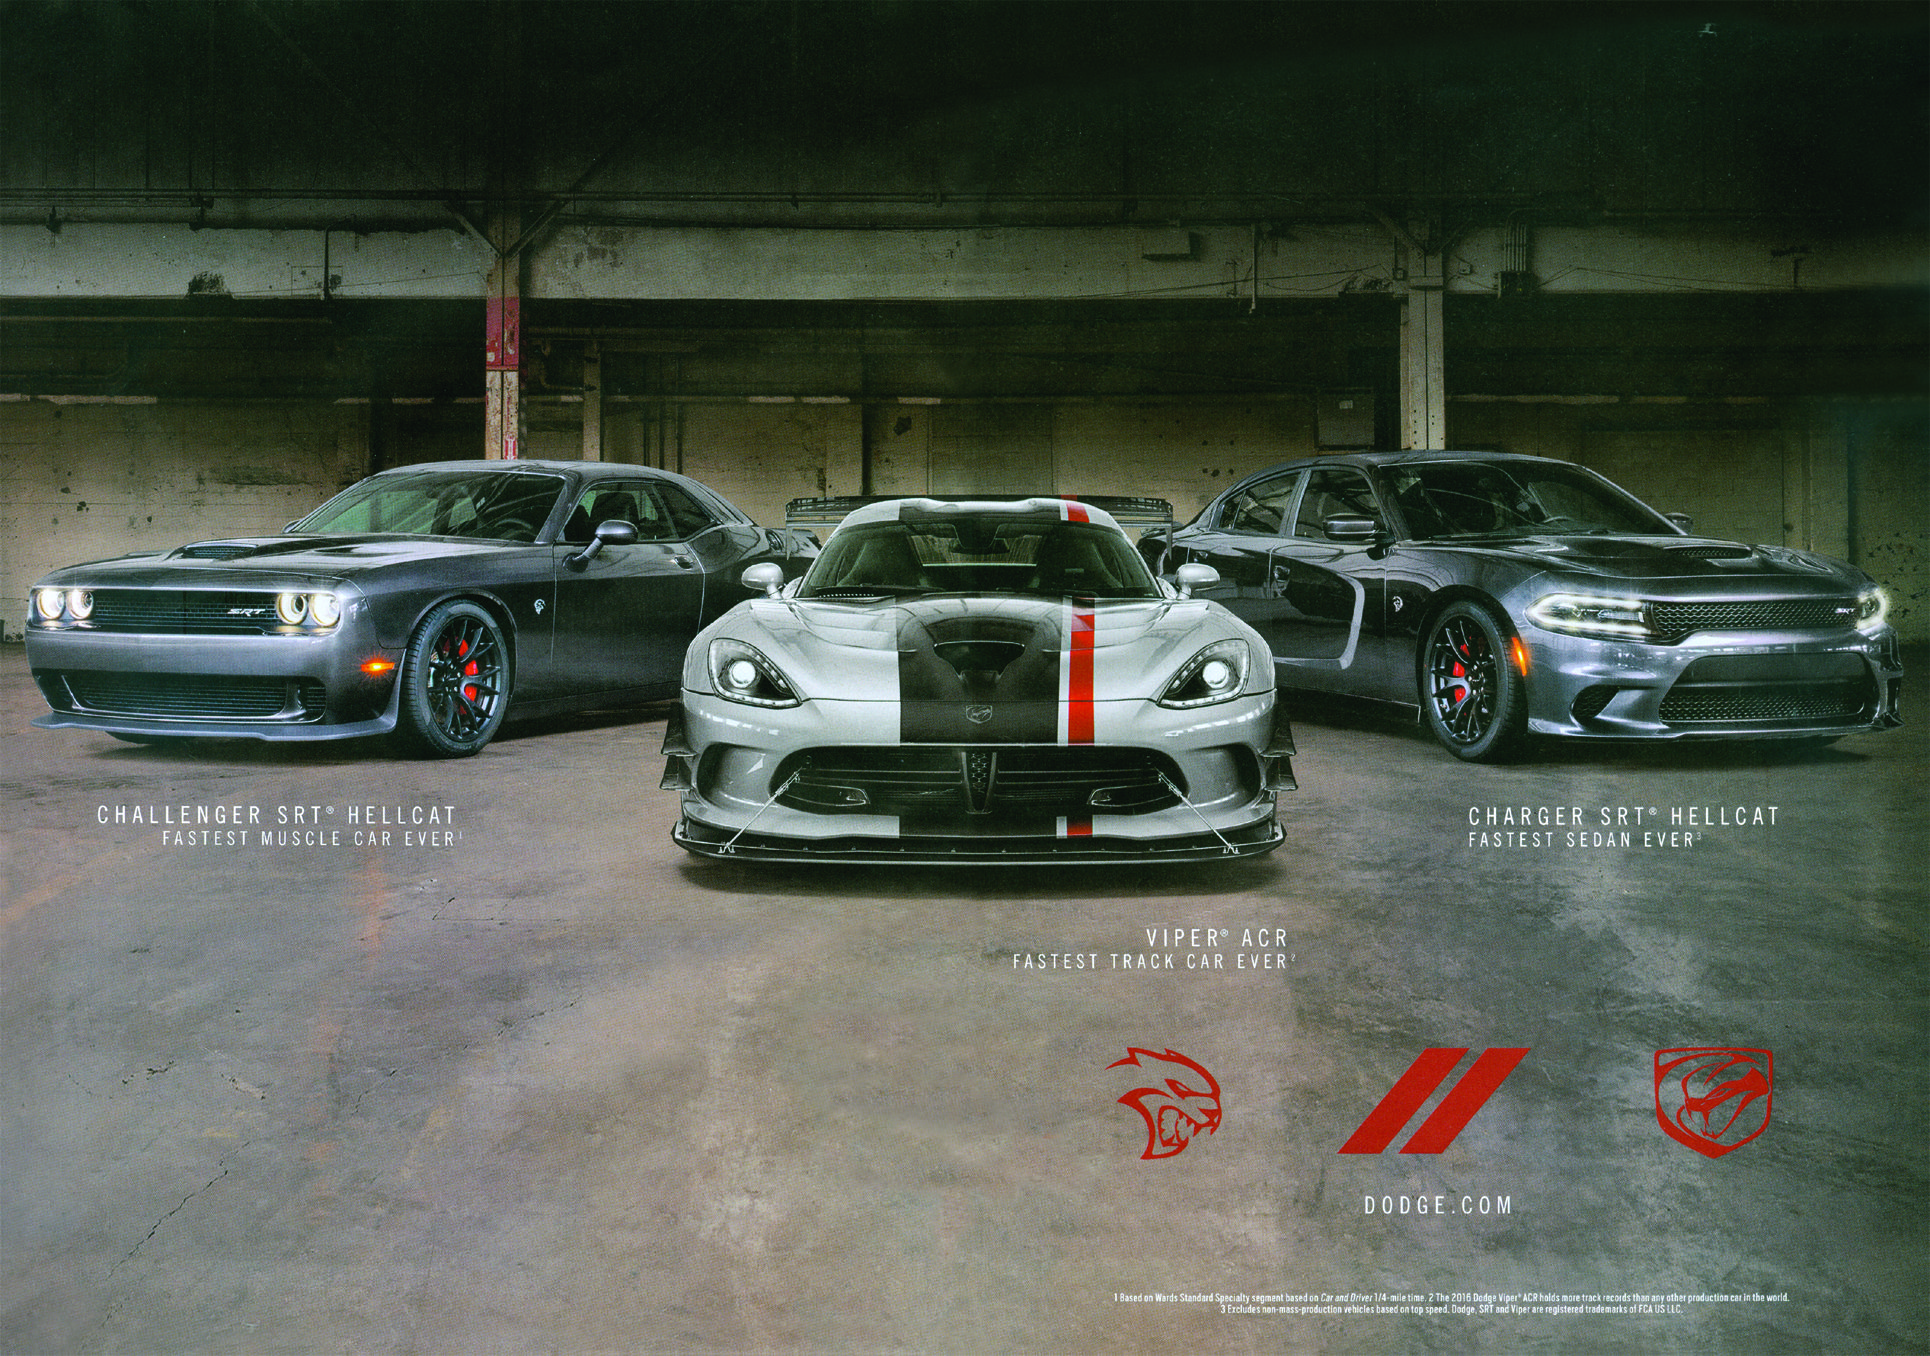 Dodge Challenger Hellcat Viper Charger Hellcat 2016 Print Ad